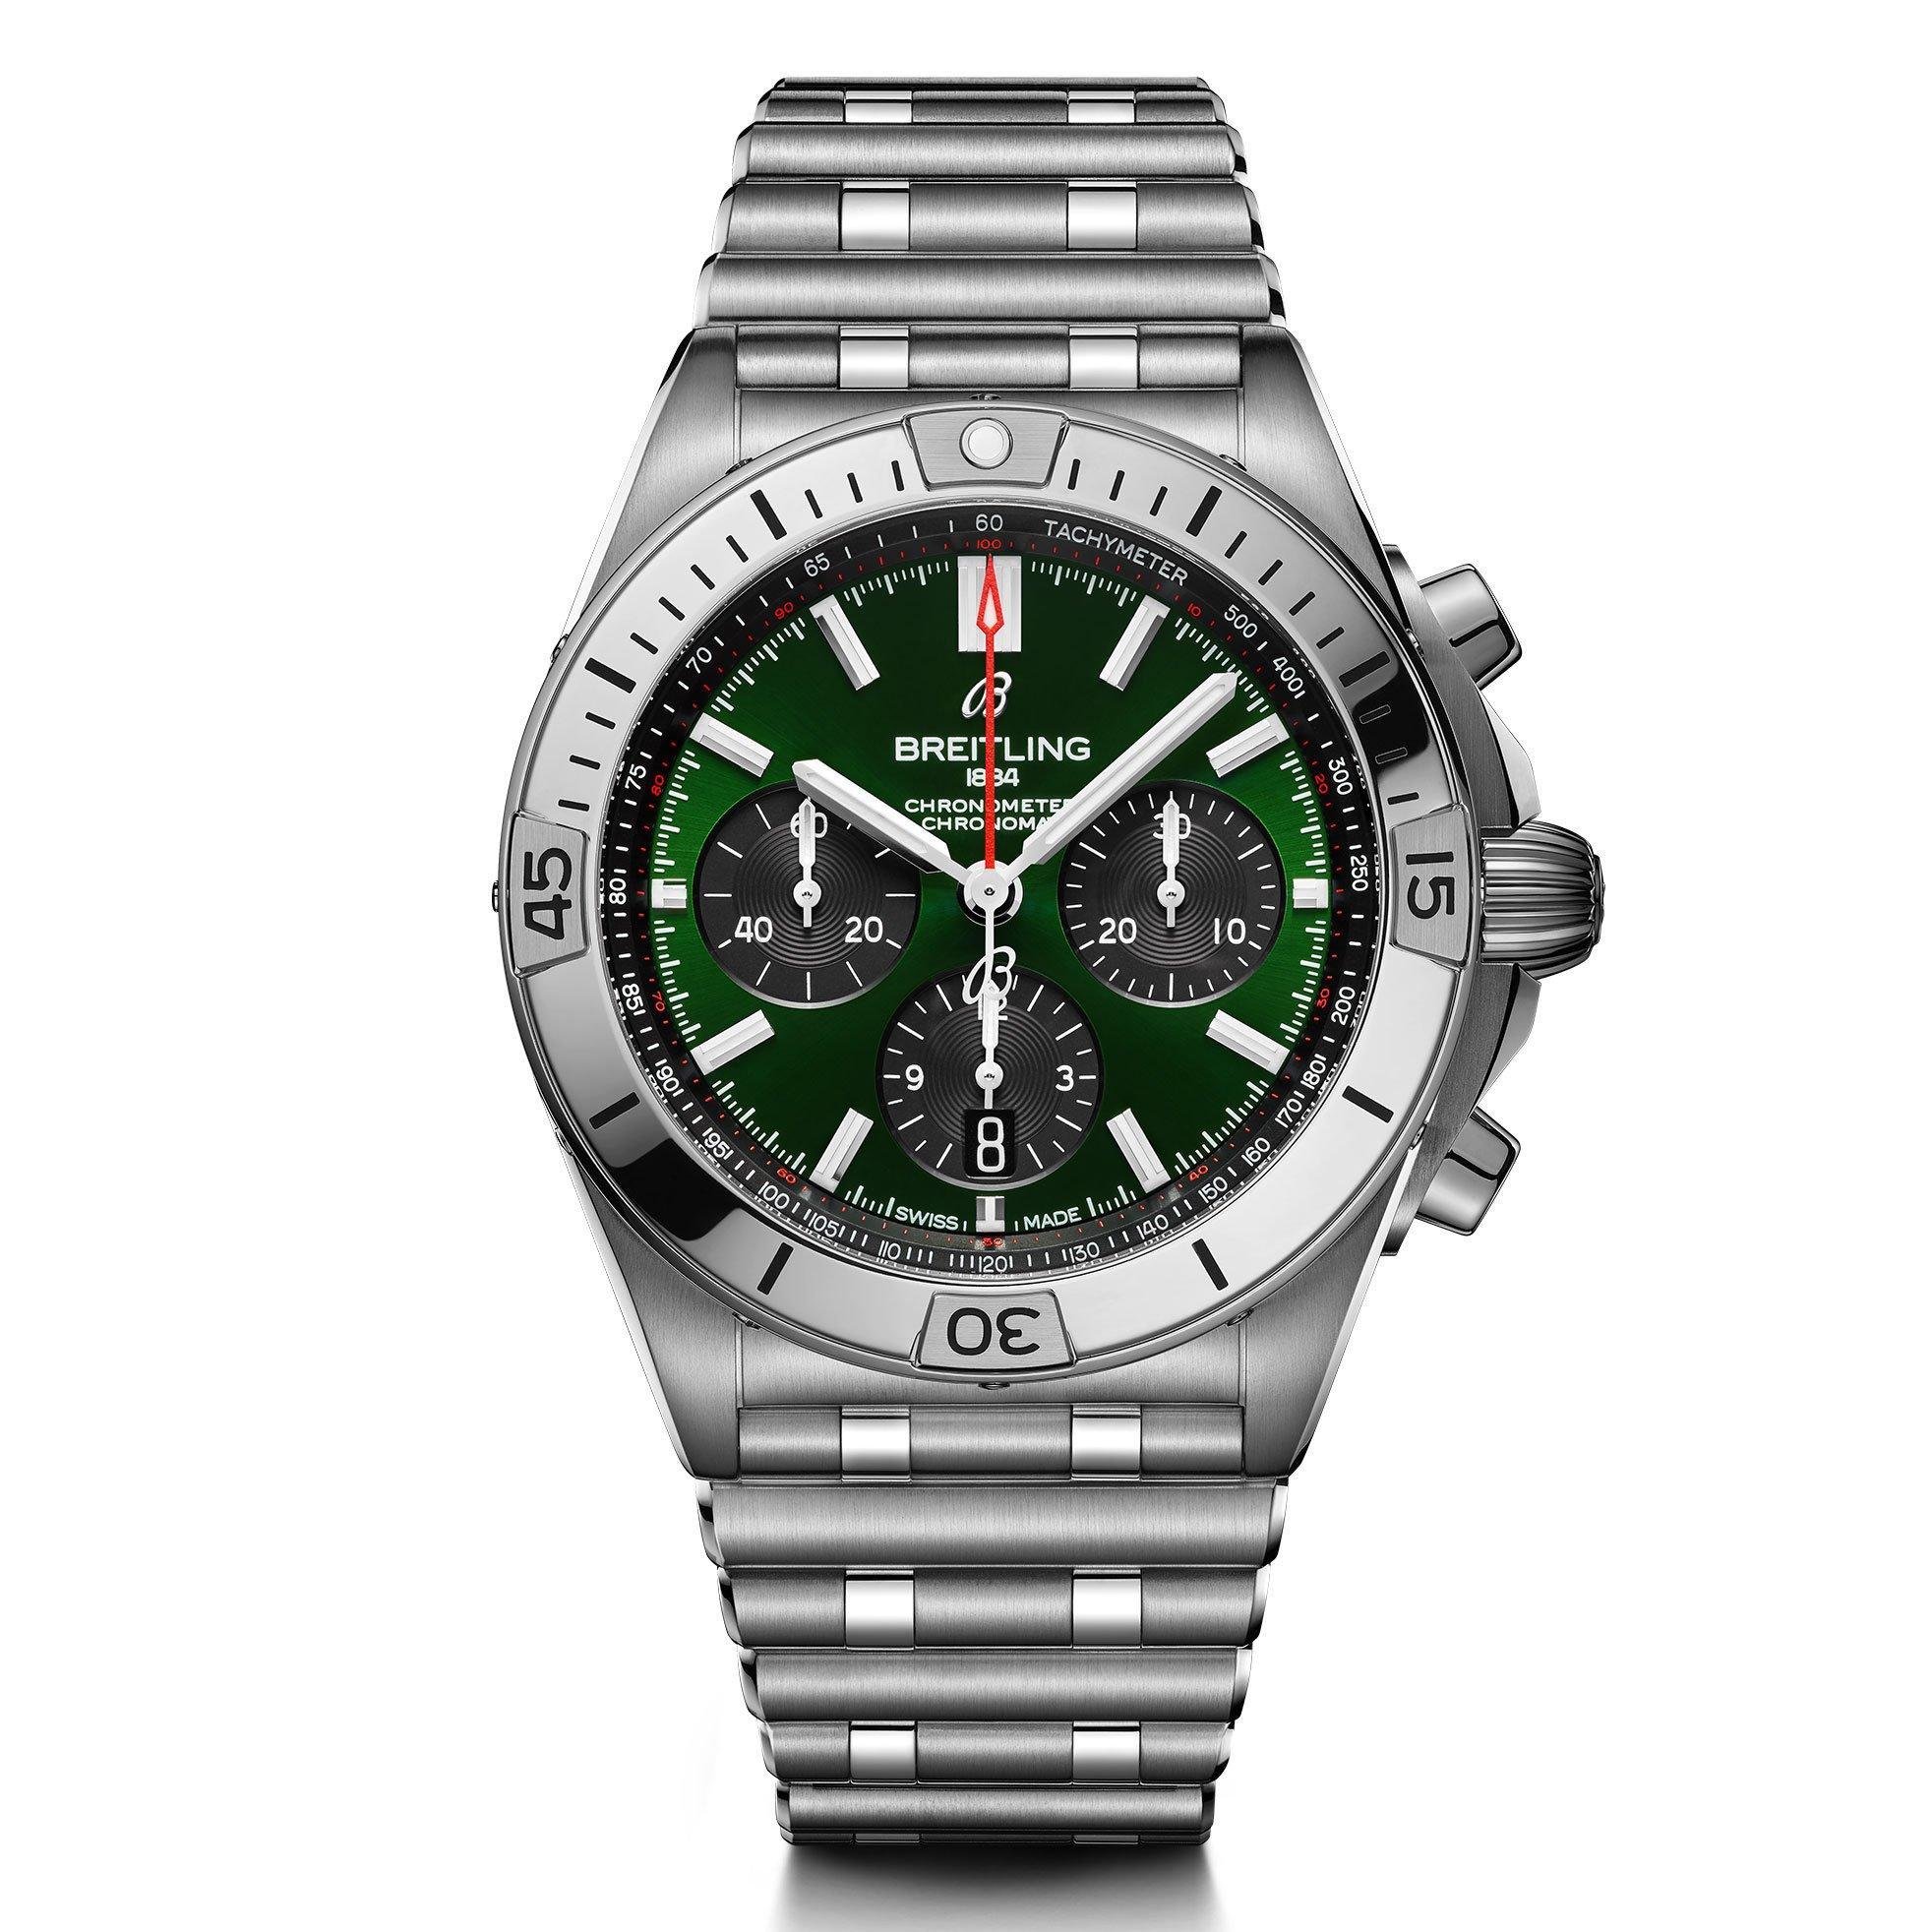 Breitling Chronomat B01 42 Bentley Chronograph Men's Watch